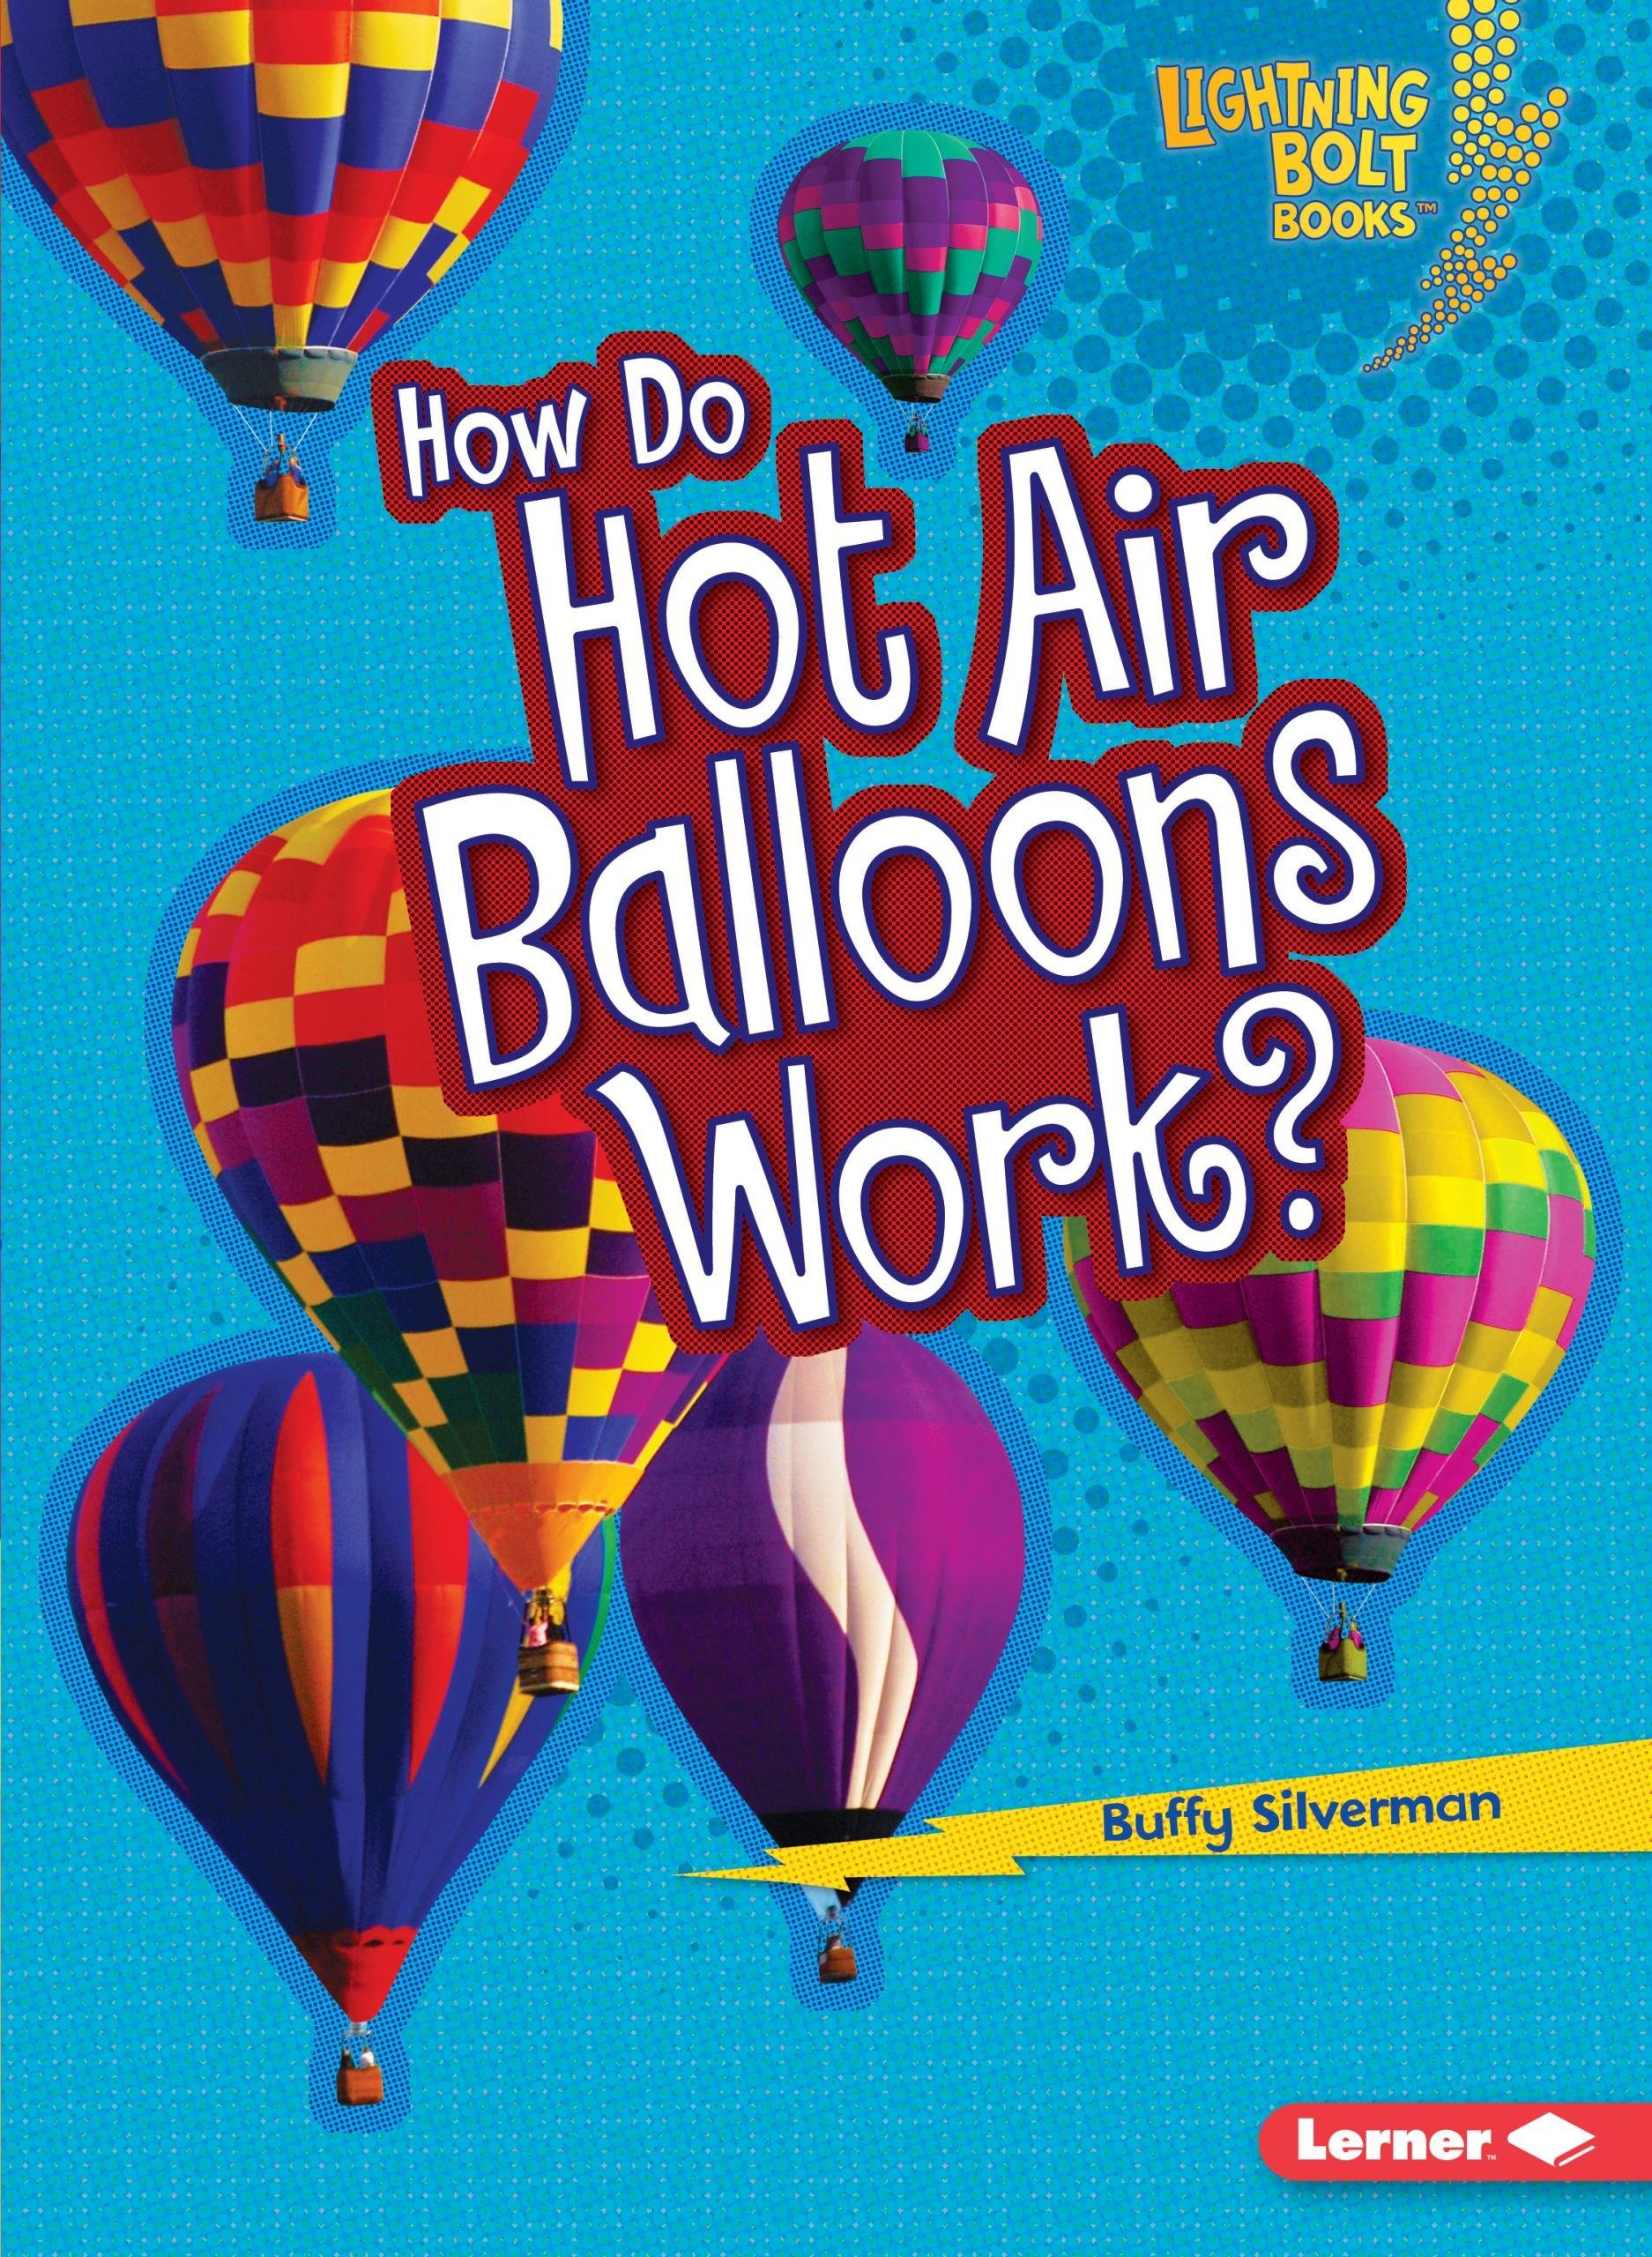 How Do Hot Air Balloons Work? (Lightning Bolt Books)